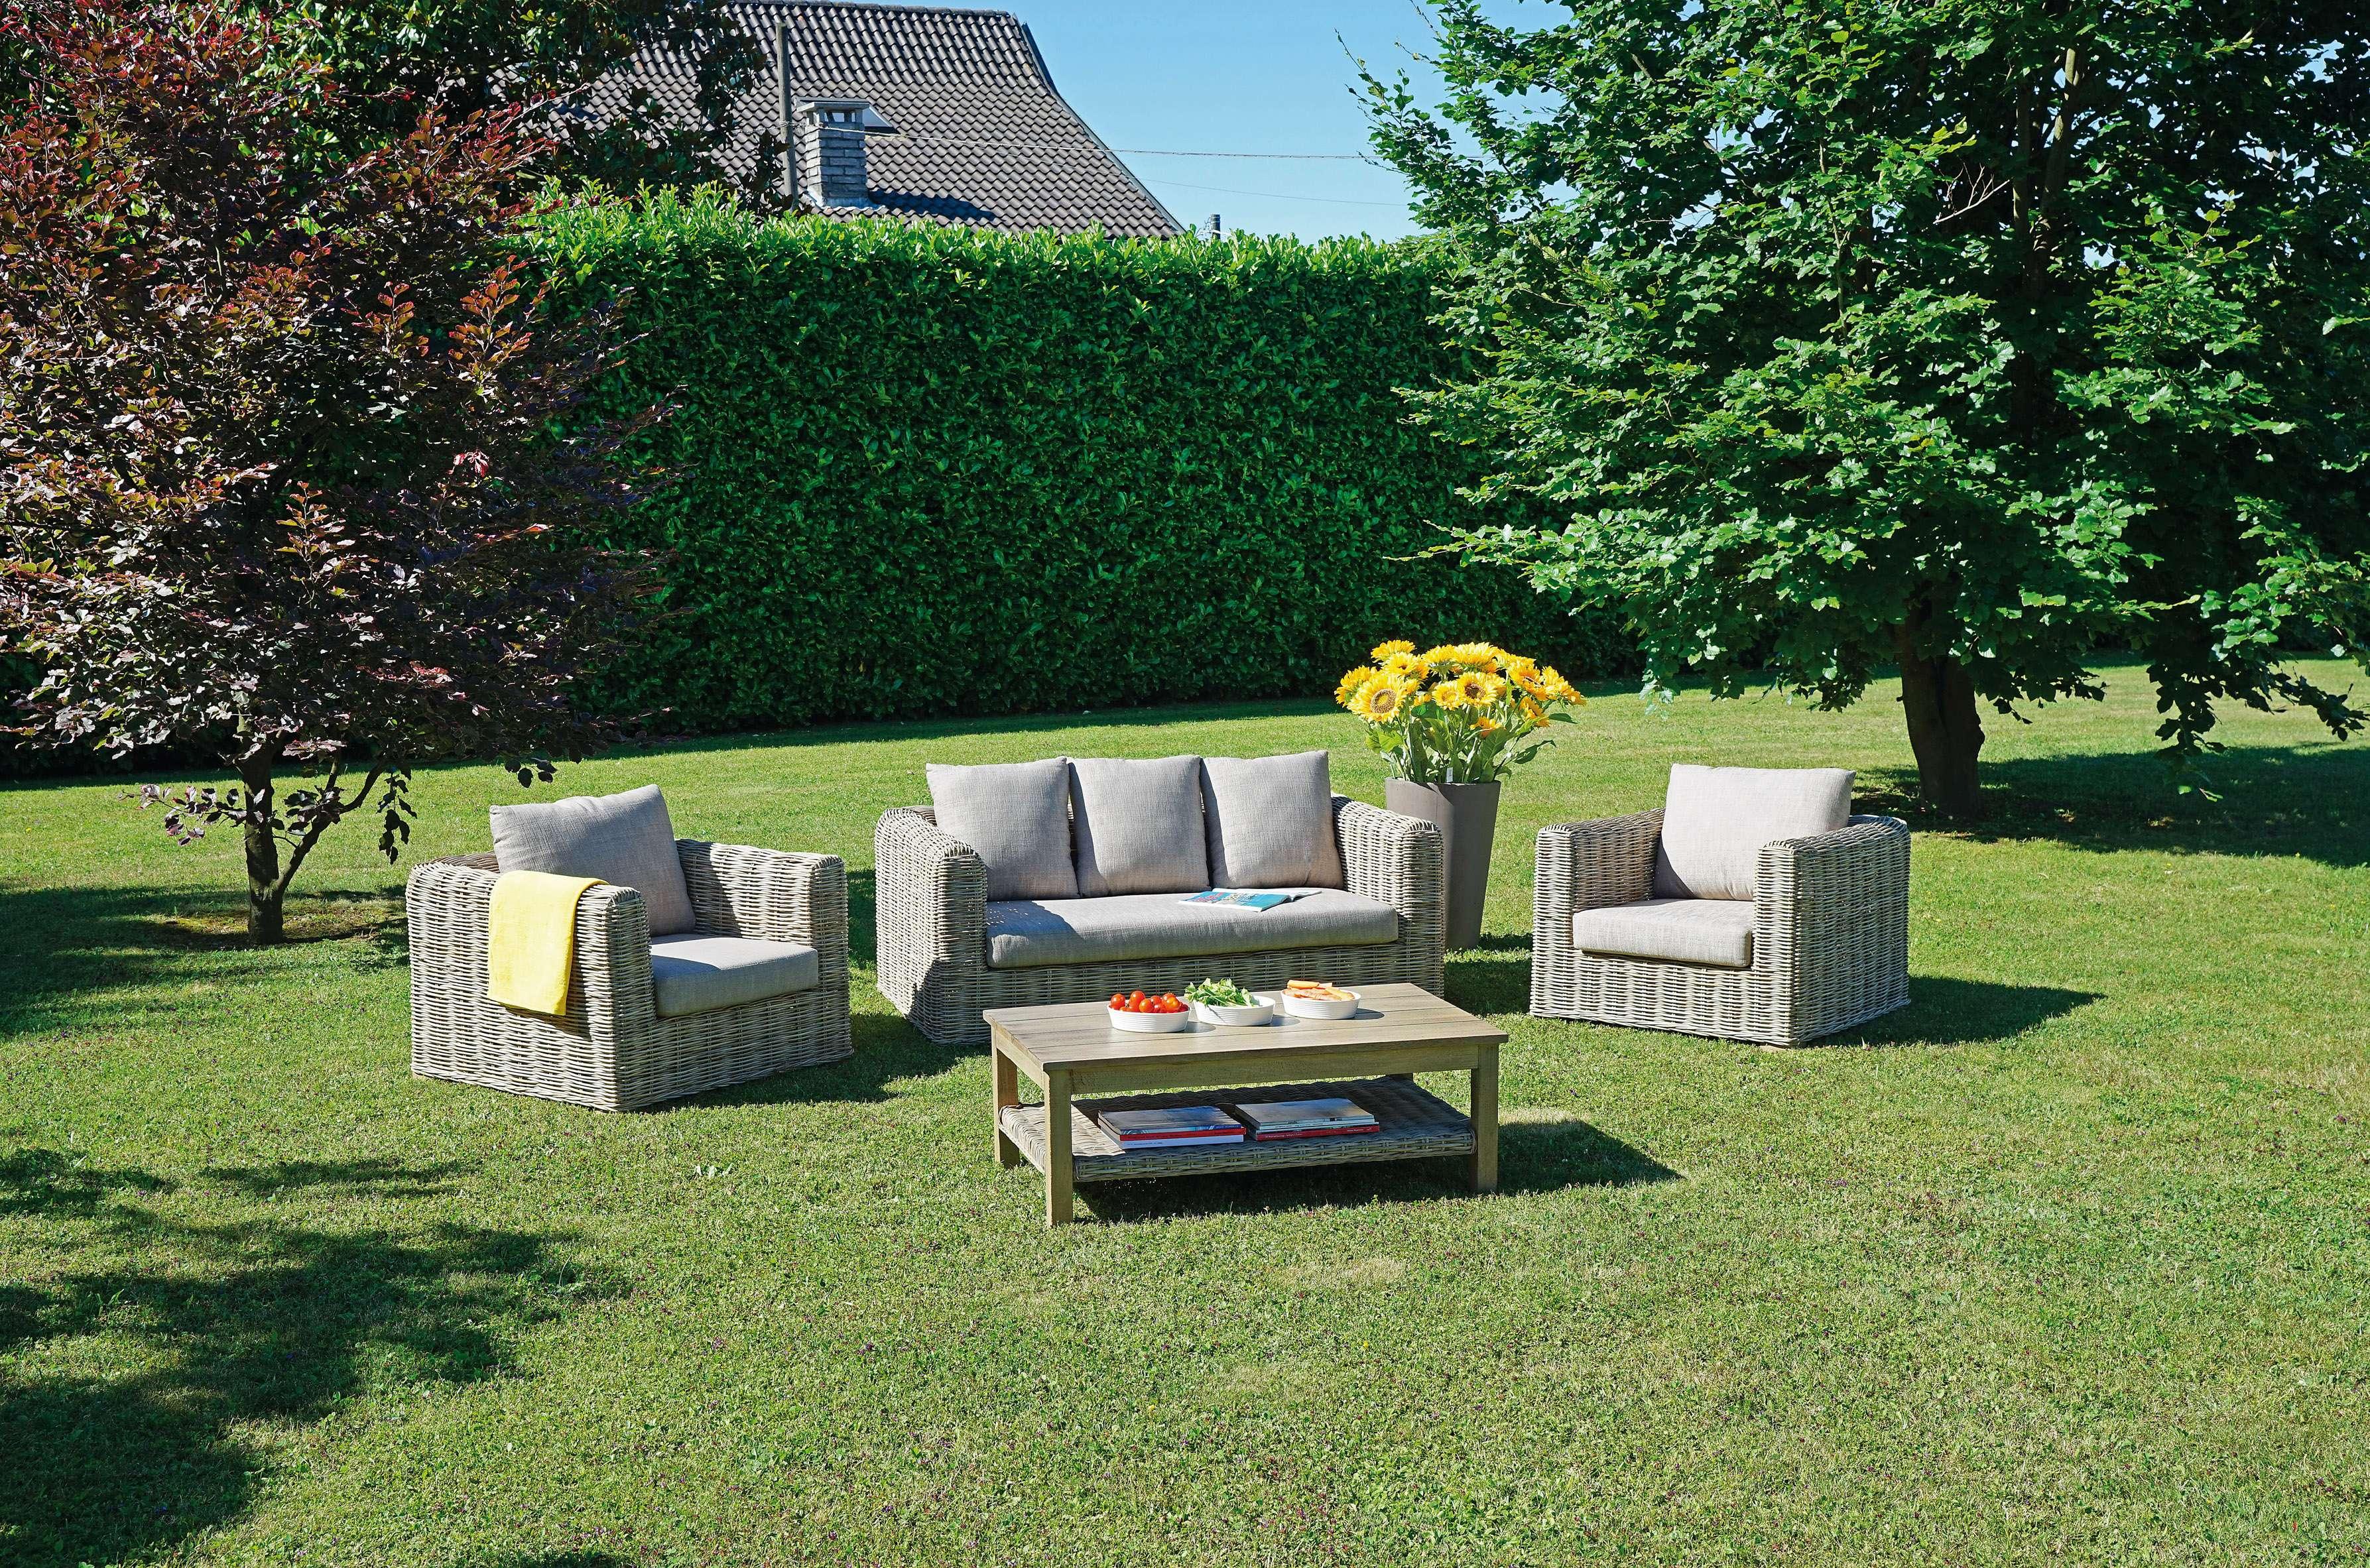 Ambientazione pes19 greenwood mobili da giardino - Mobili da giardino in teak ...